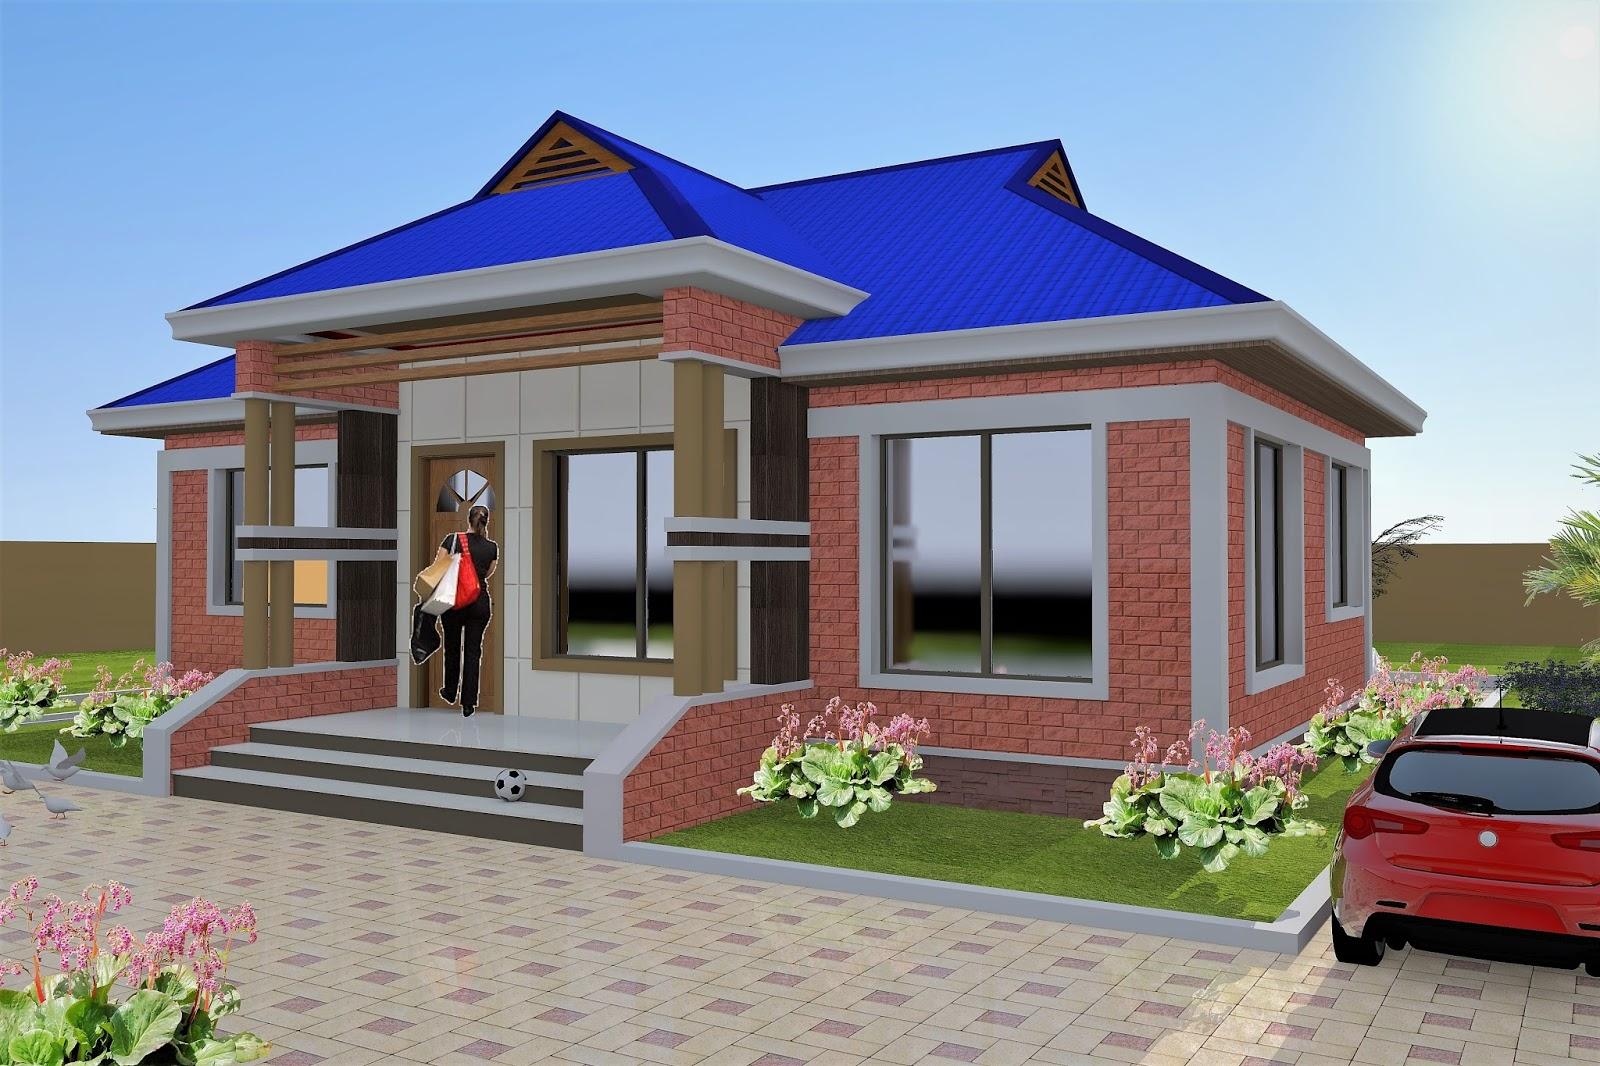 3 Bedroom House Plan (Hydroform Bricks) (ID MA-052)